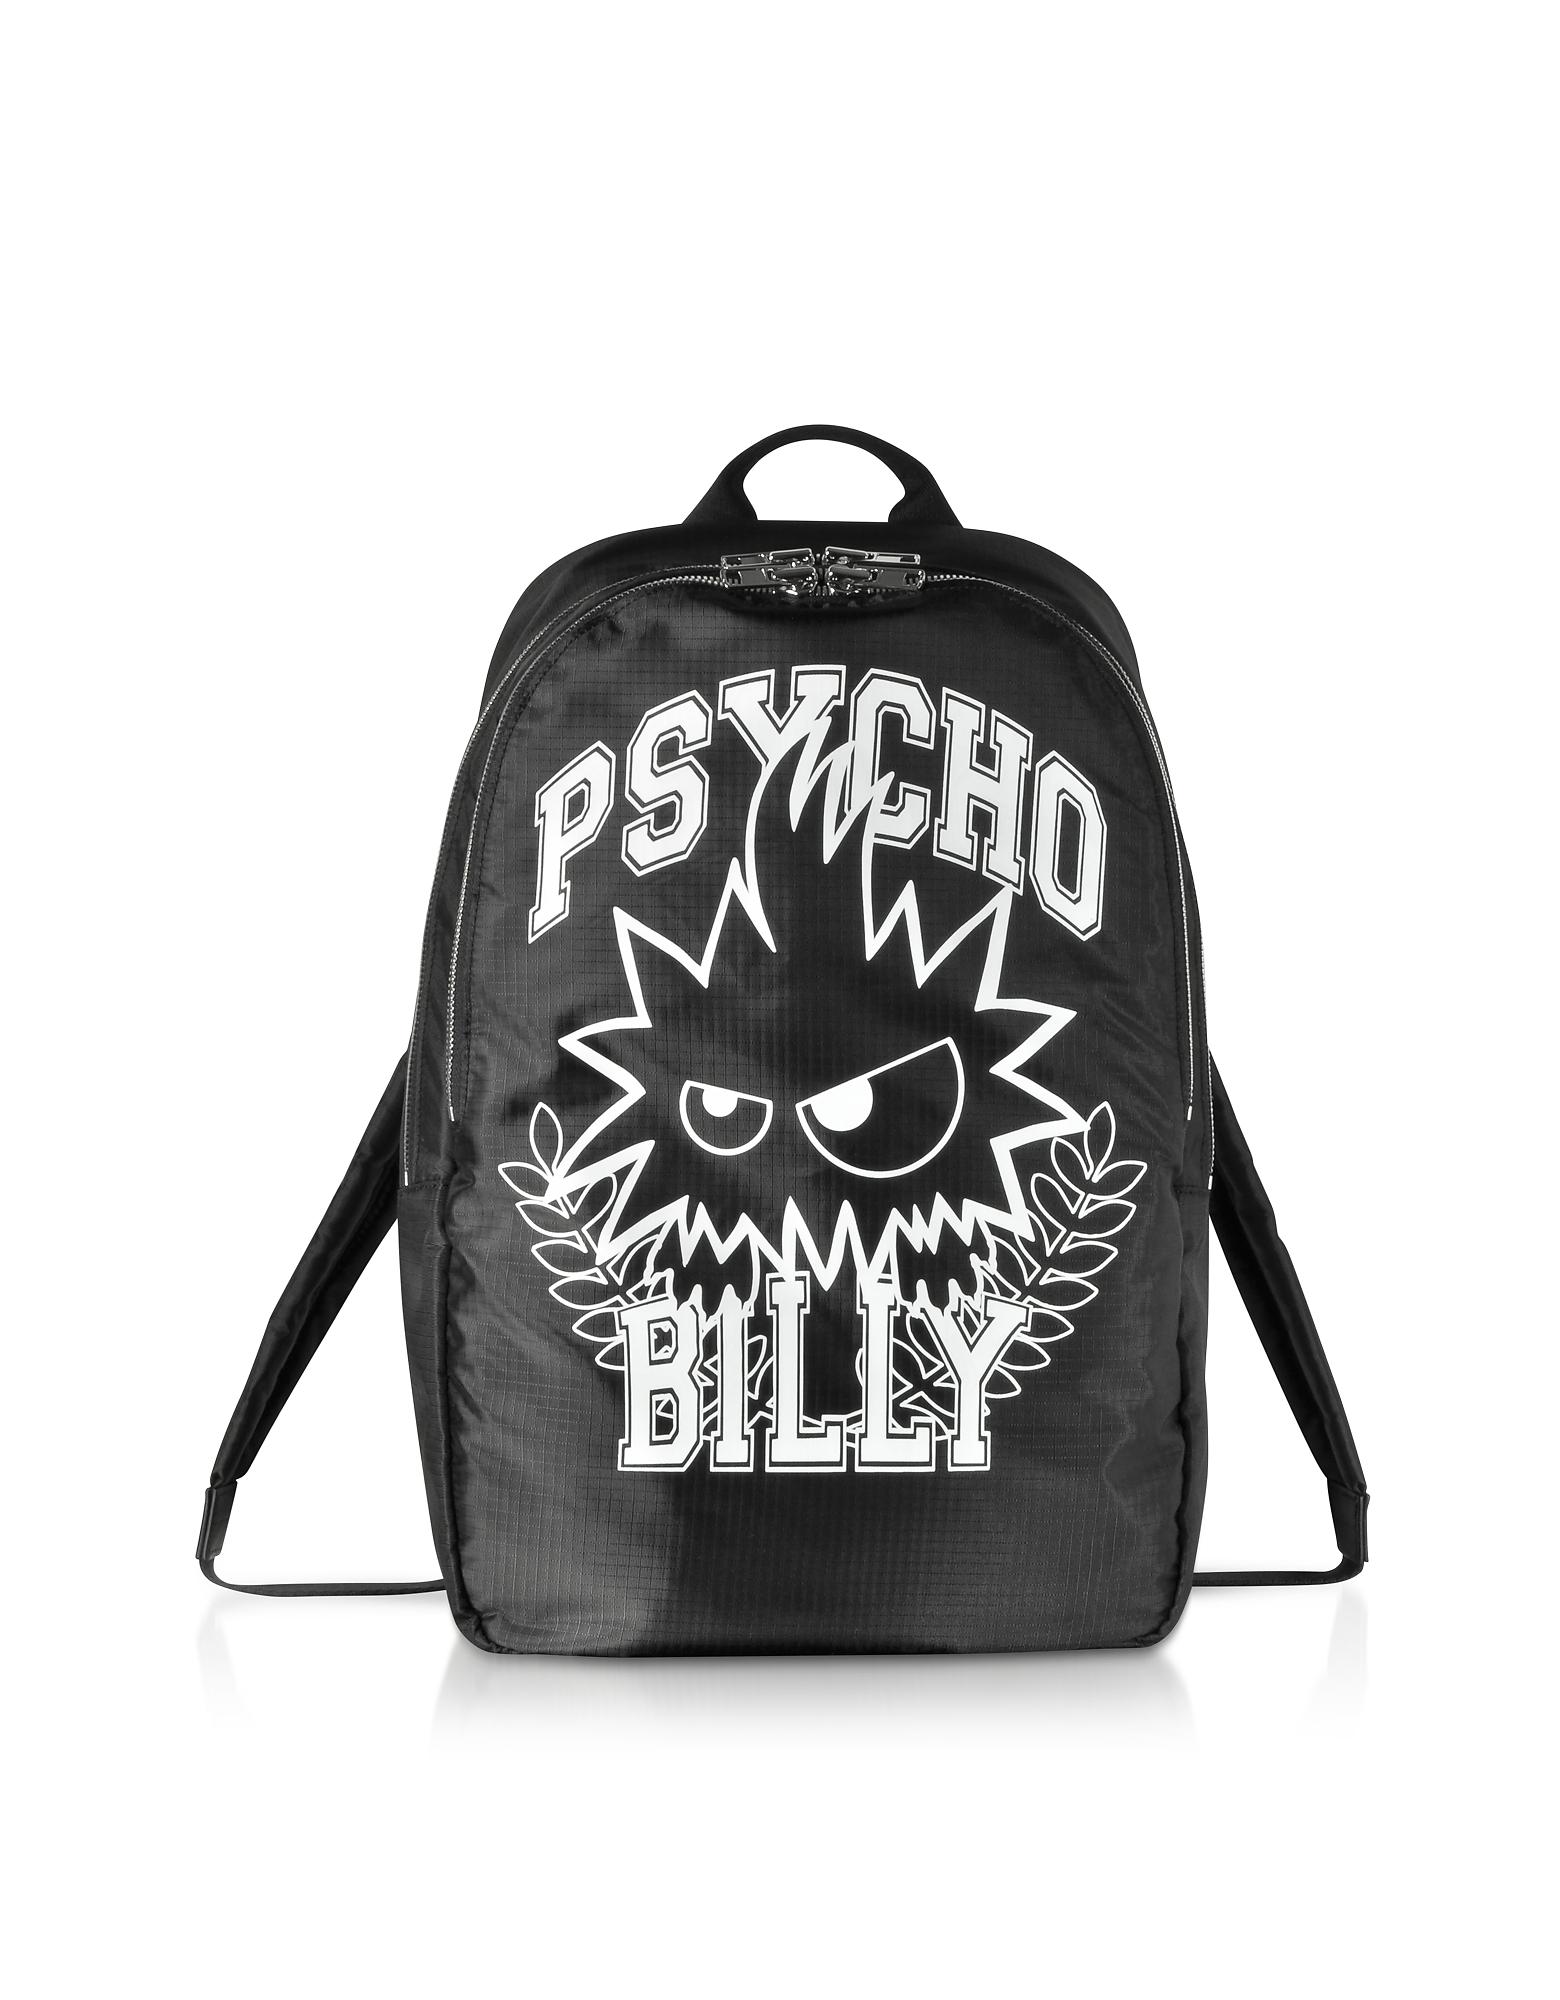 McQ Alexander McQueen Backpacks, Psycho Billy Black Nylon Backpack